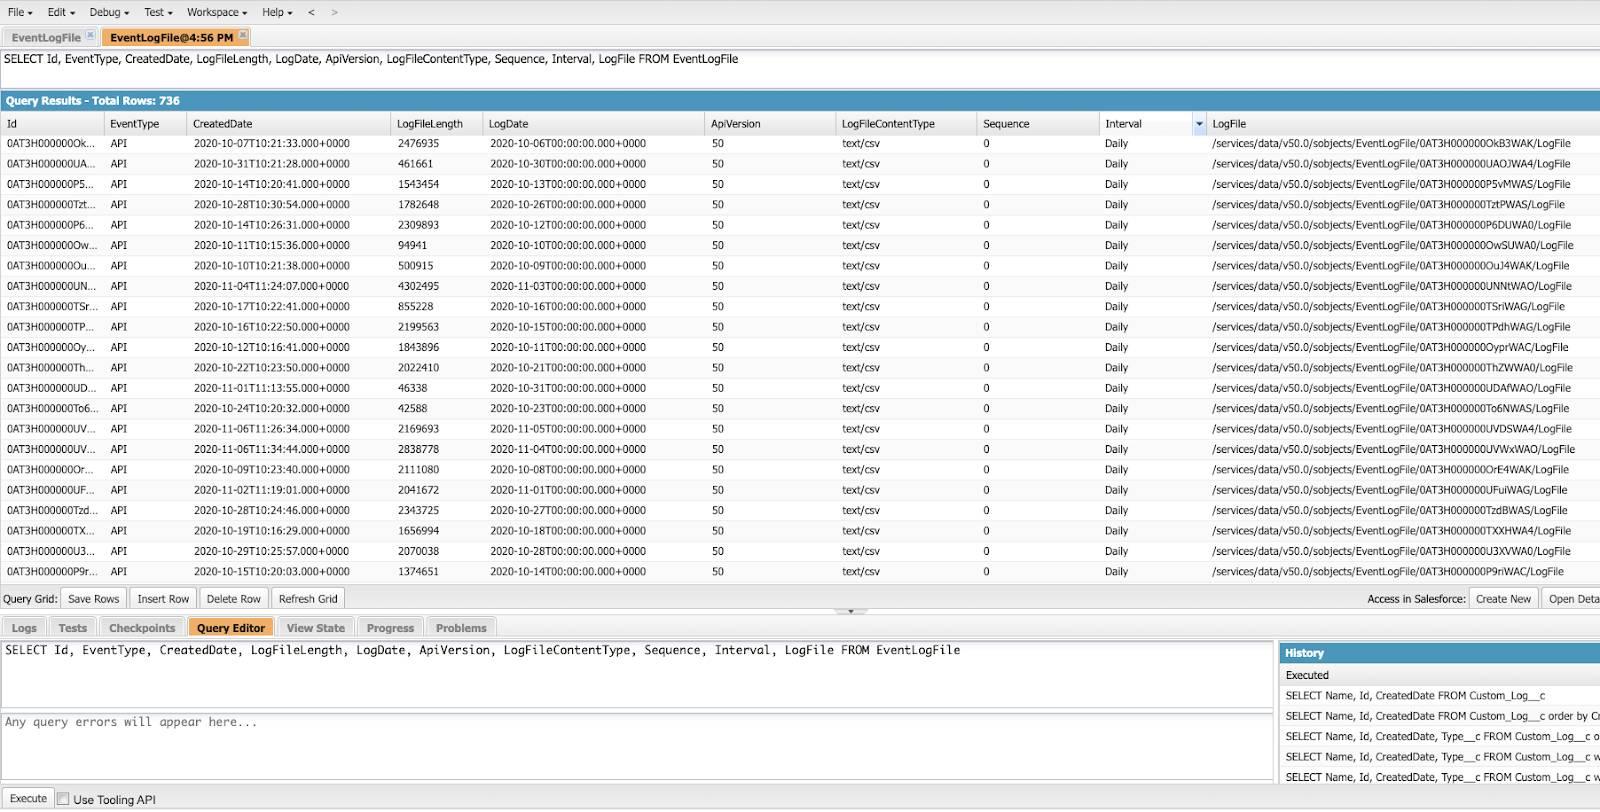 Captura de tela exibindo resultados da consulta